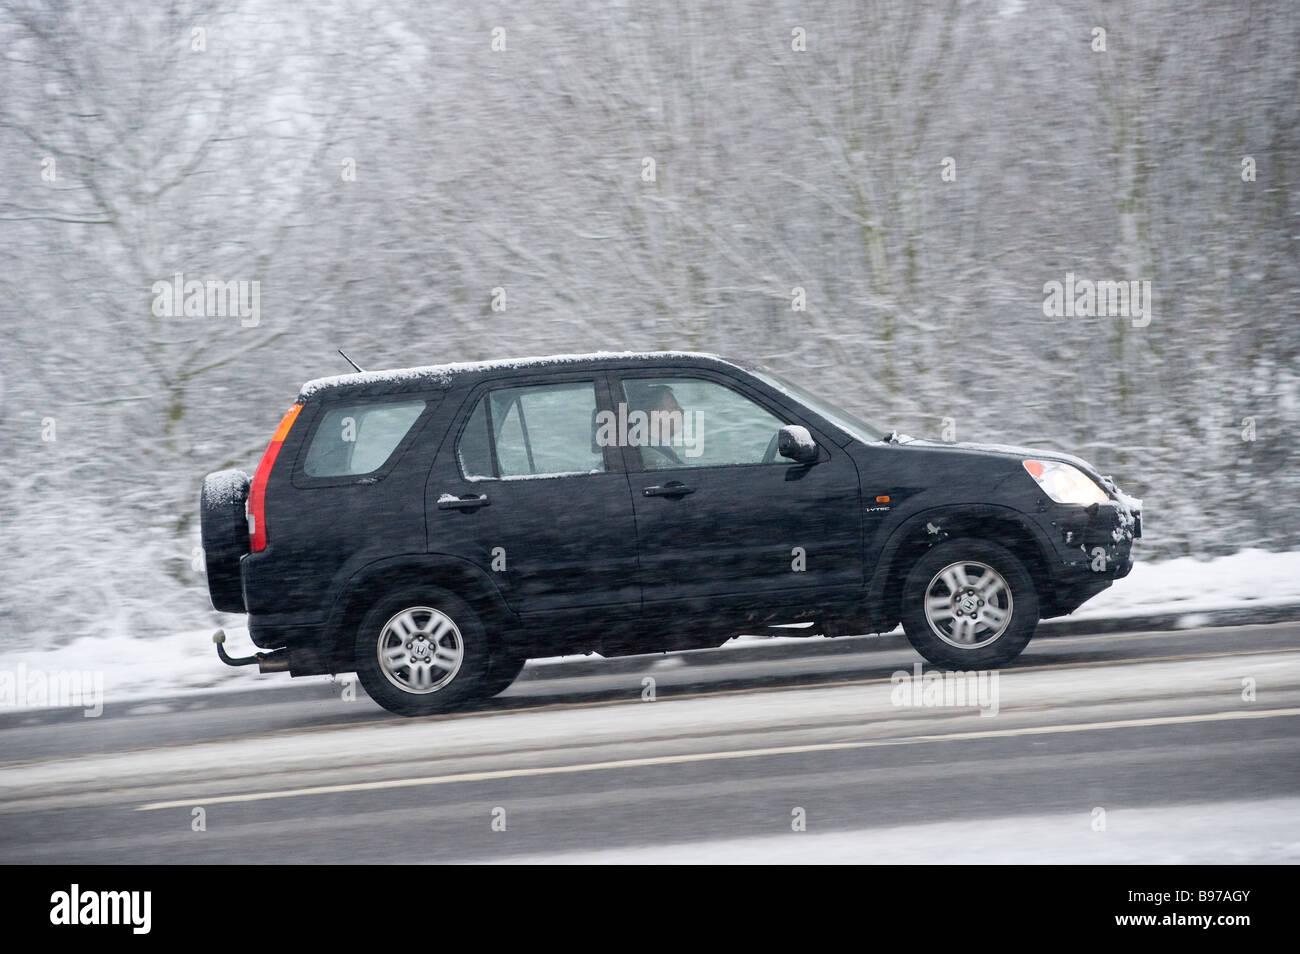 side view of a black honda hrv 4x4 car driving along a. Black Bedroom Furniture Sets. Home Design Ideas